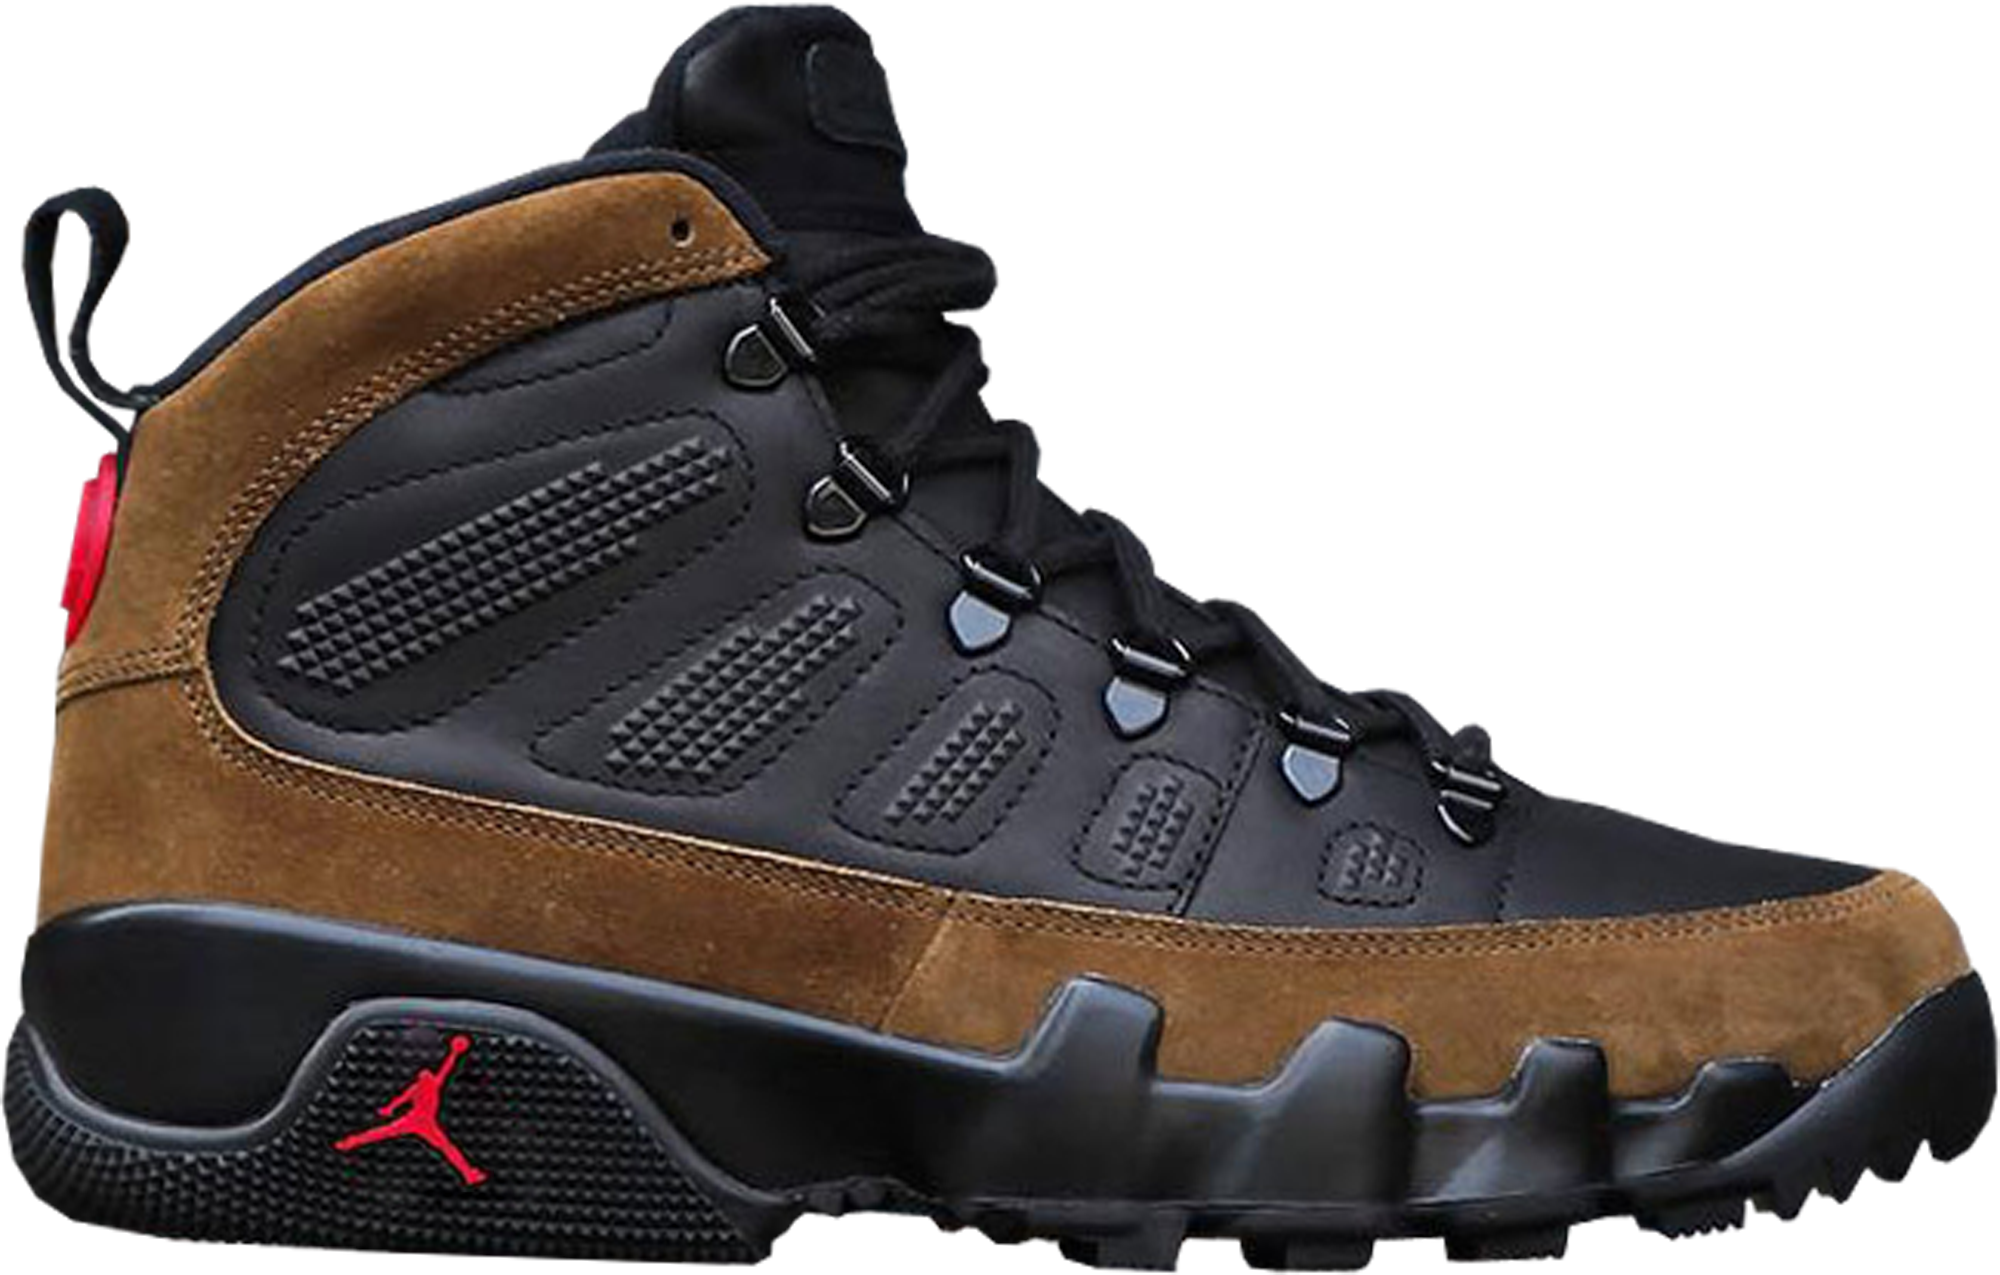 Jordan 9 Retro Boot NRG Olive - AR4491-012